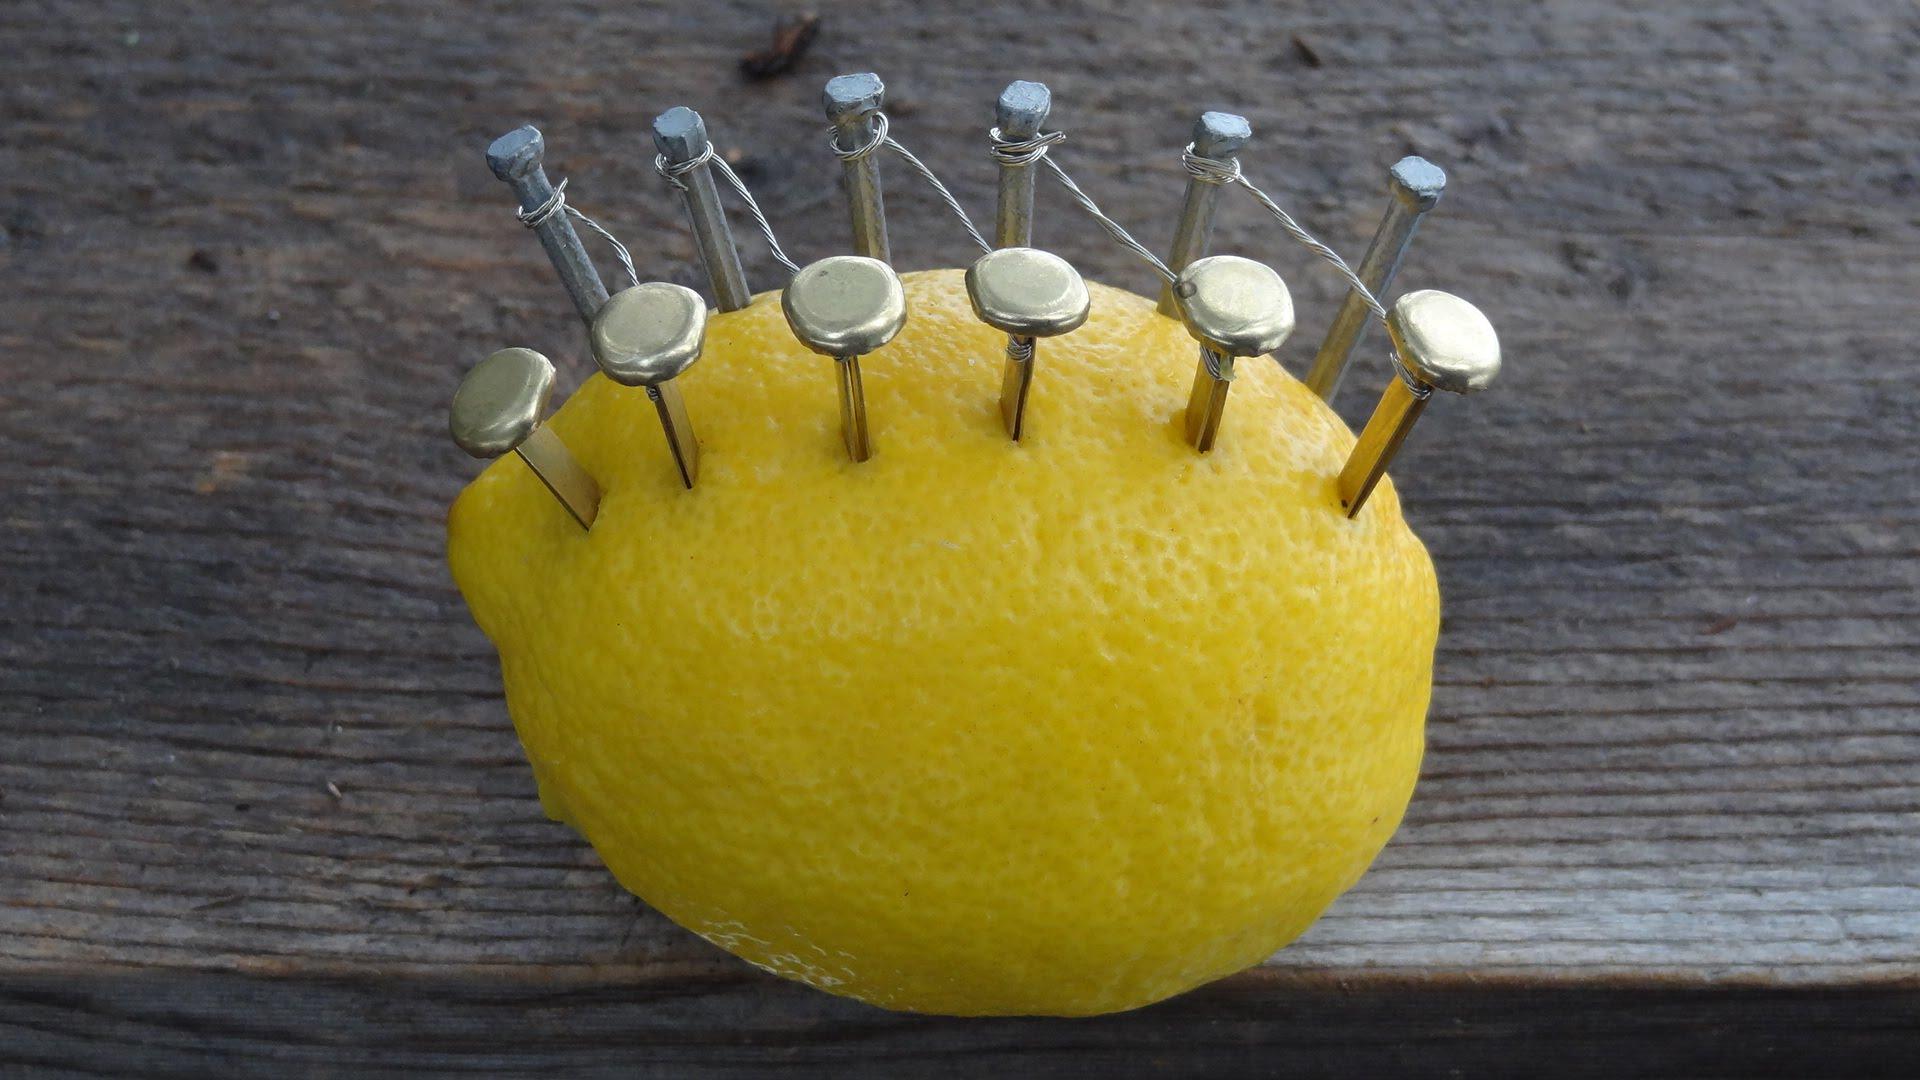 stavil-12-klinci-vo-limon-koga-k.jpg